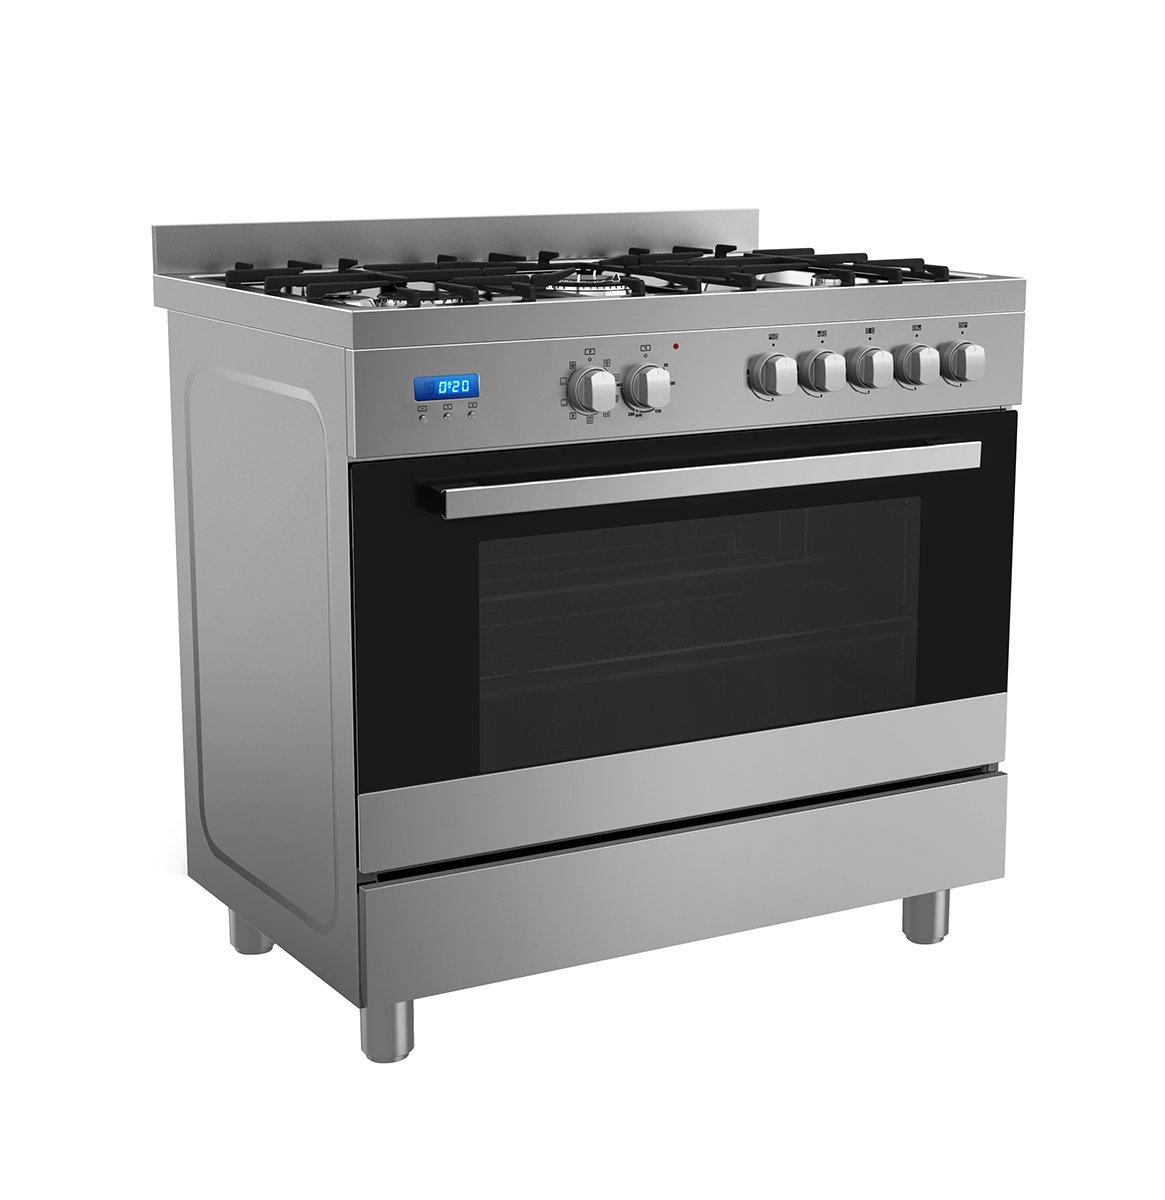 Oven Gas Stove Midea 36sme5gfr00p48 Freestanding Dual Fuel Oven Stove